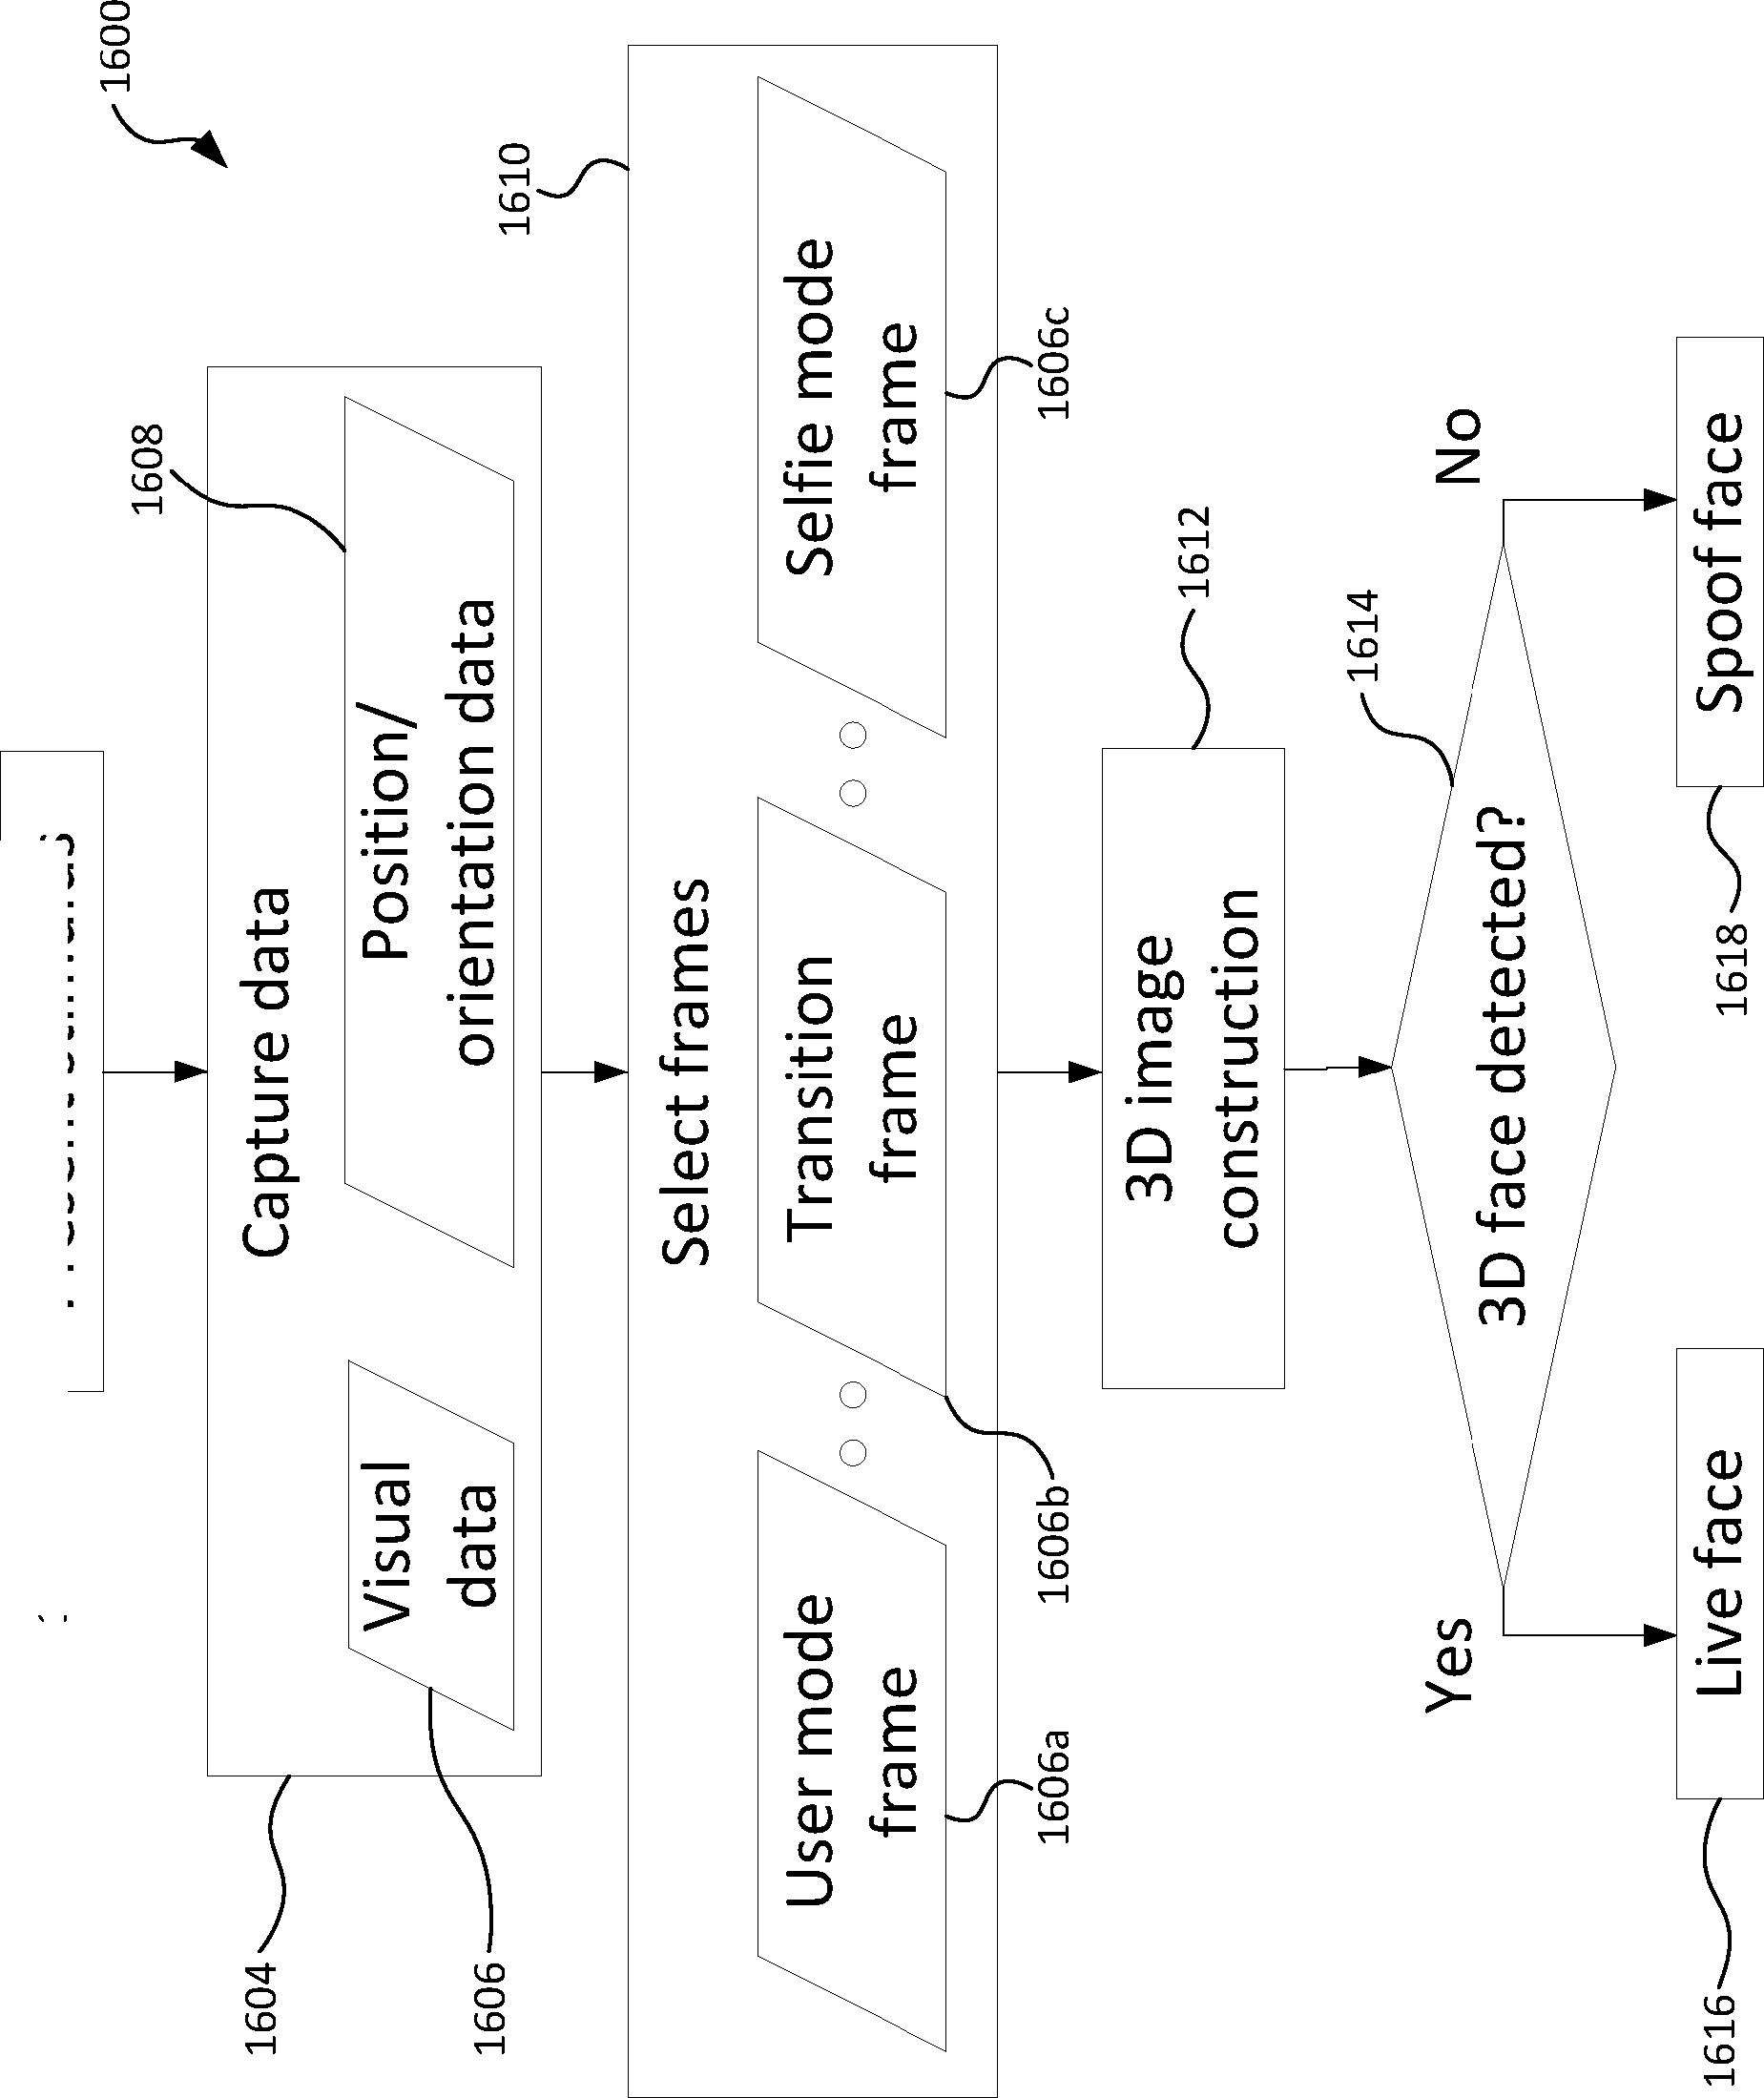 Figure GB2560340A_D0024